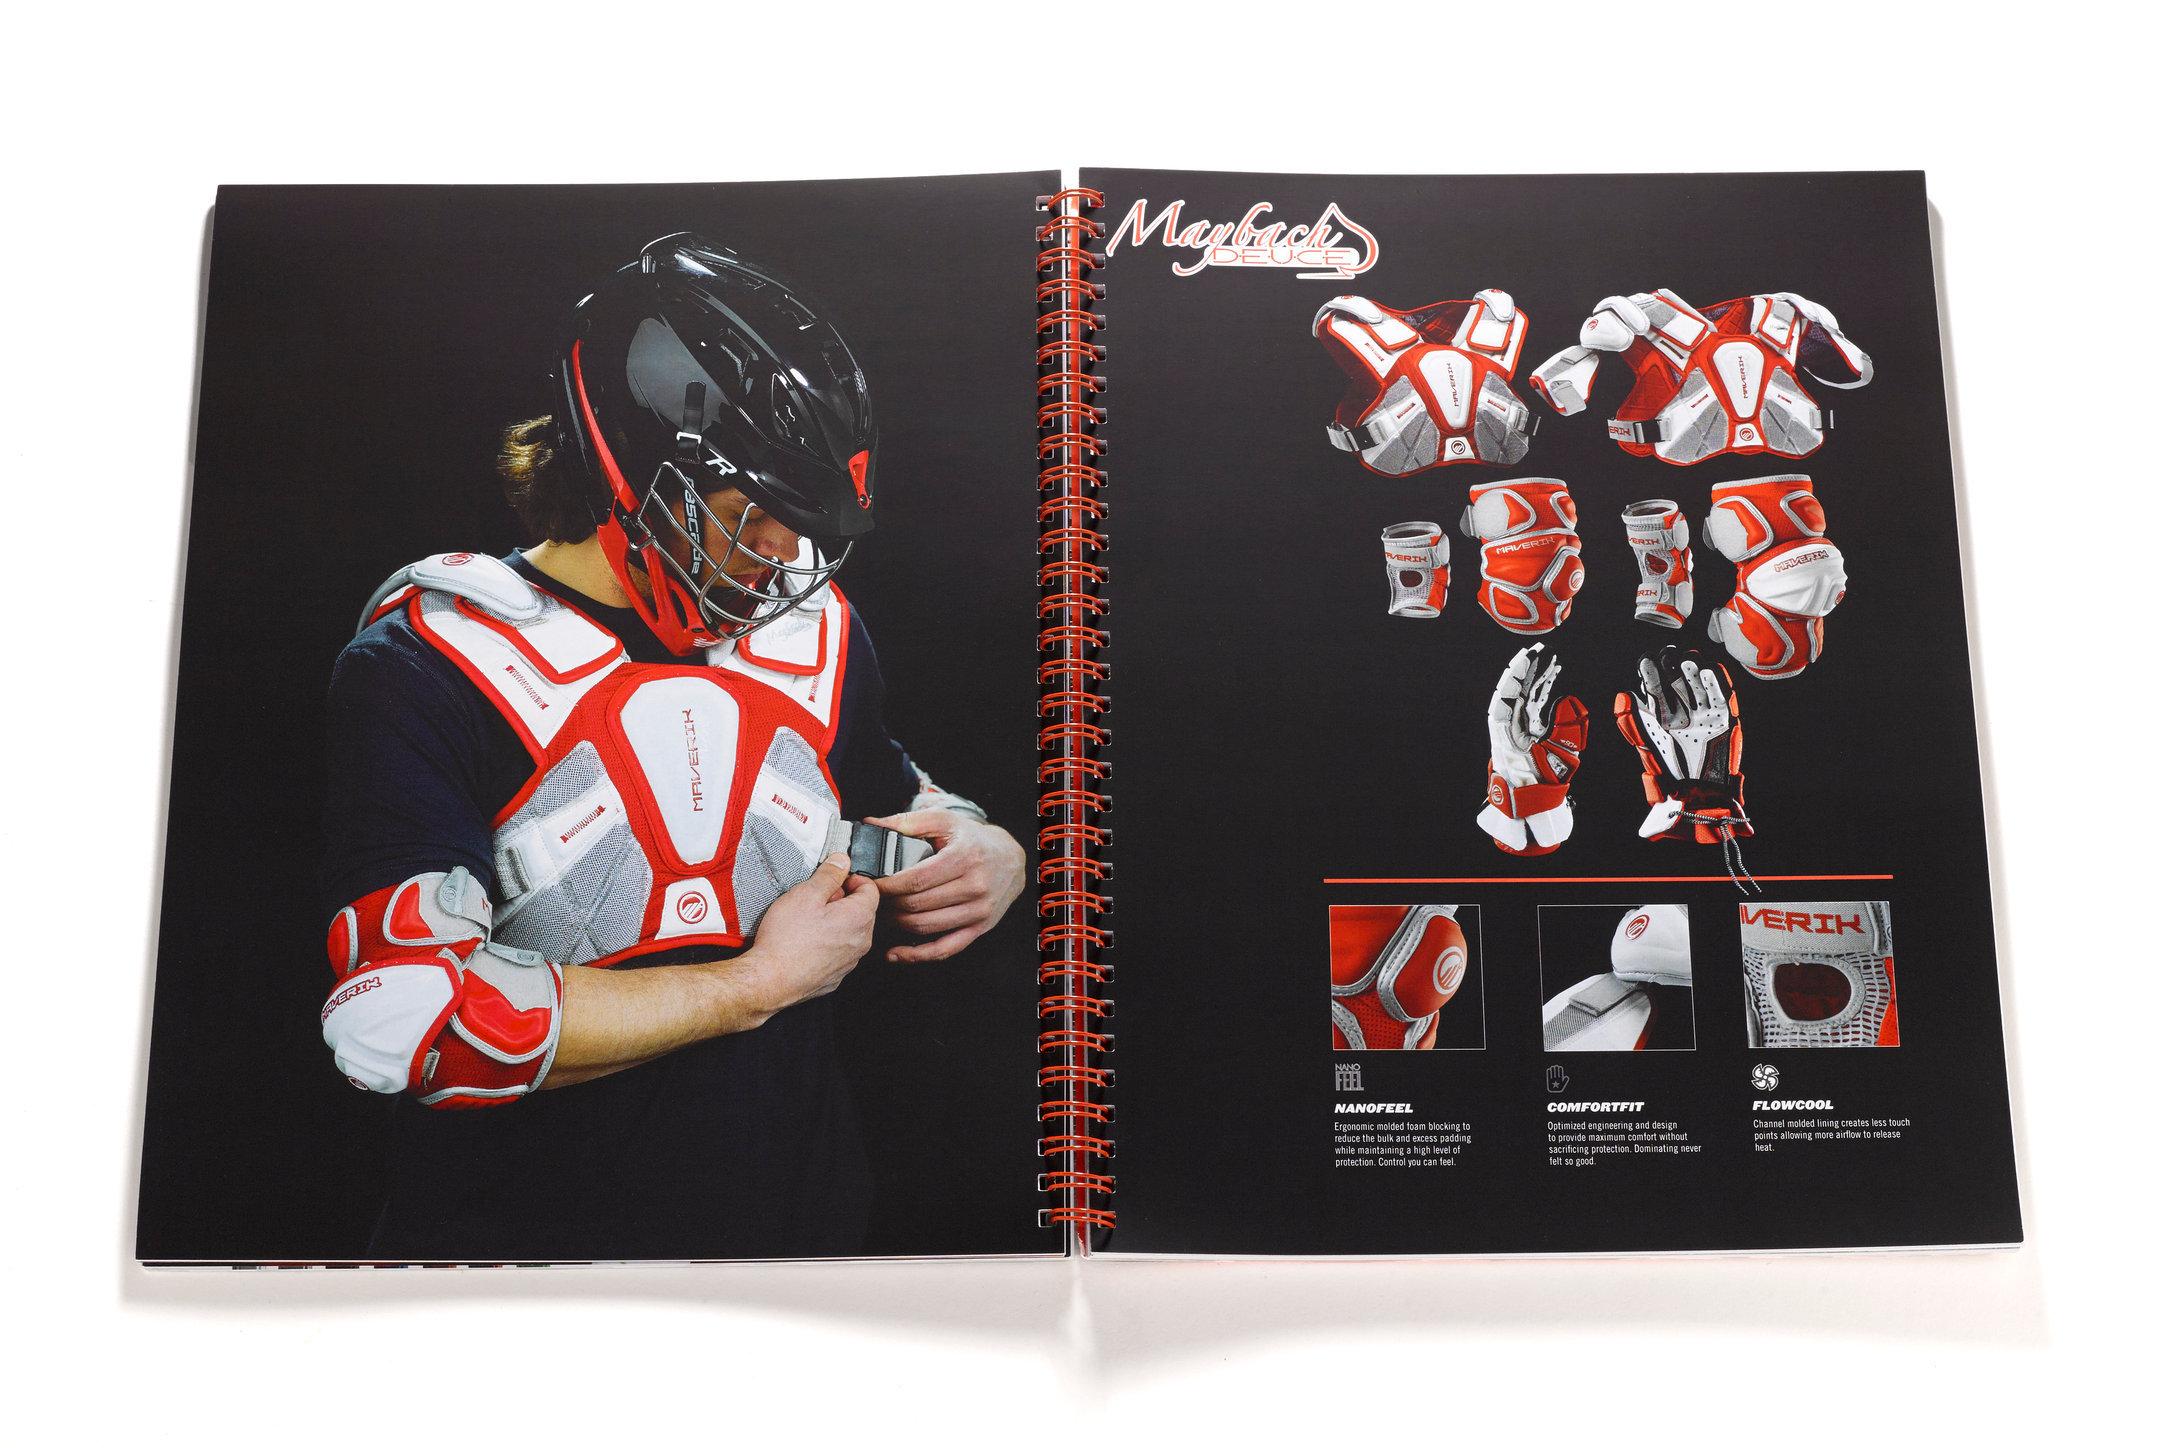 Maverik Lacrosse dealer catalog